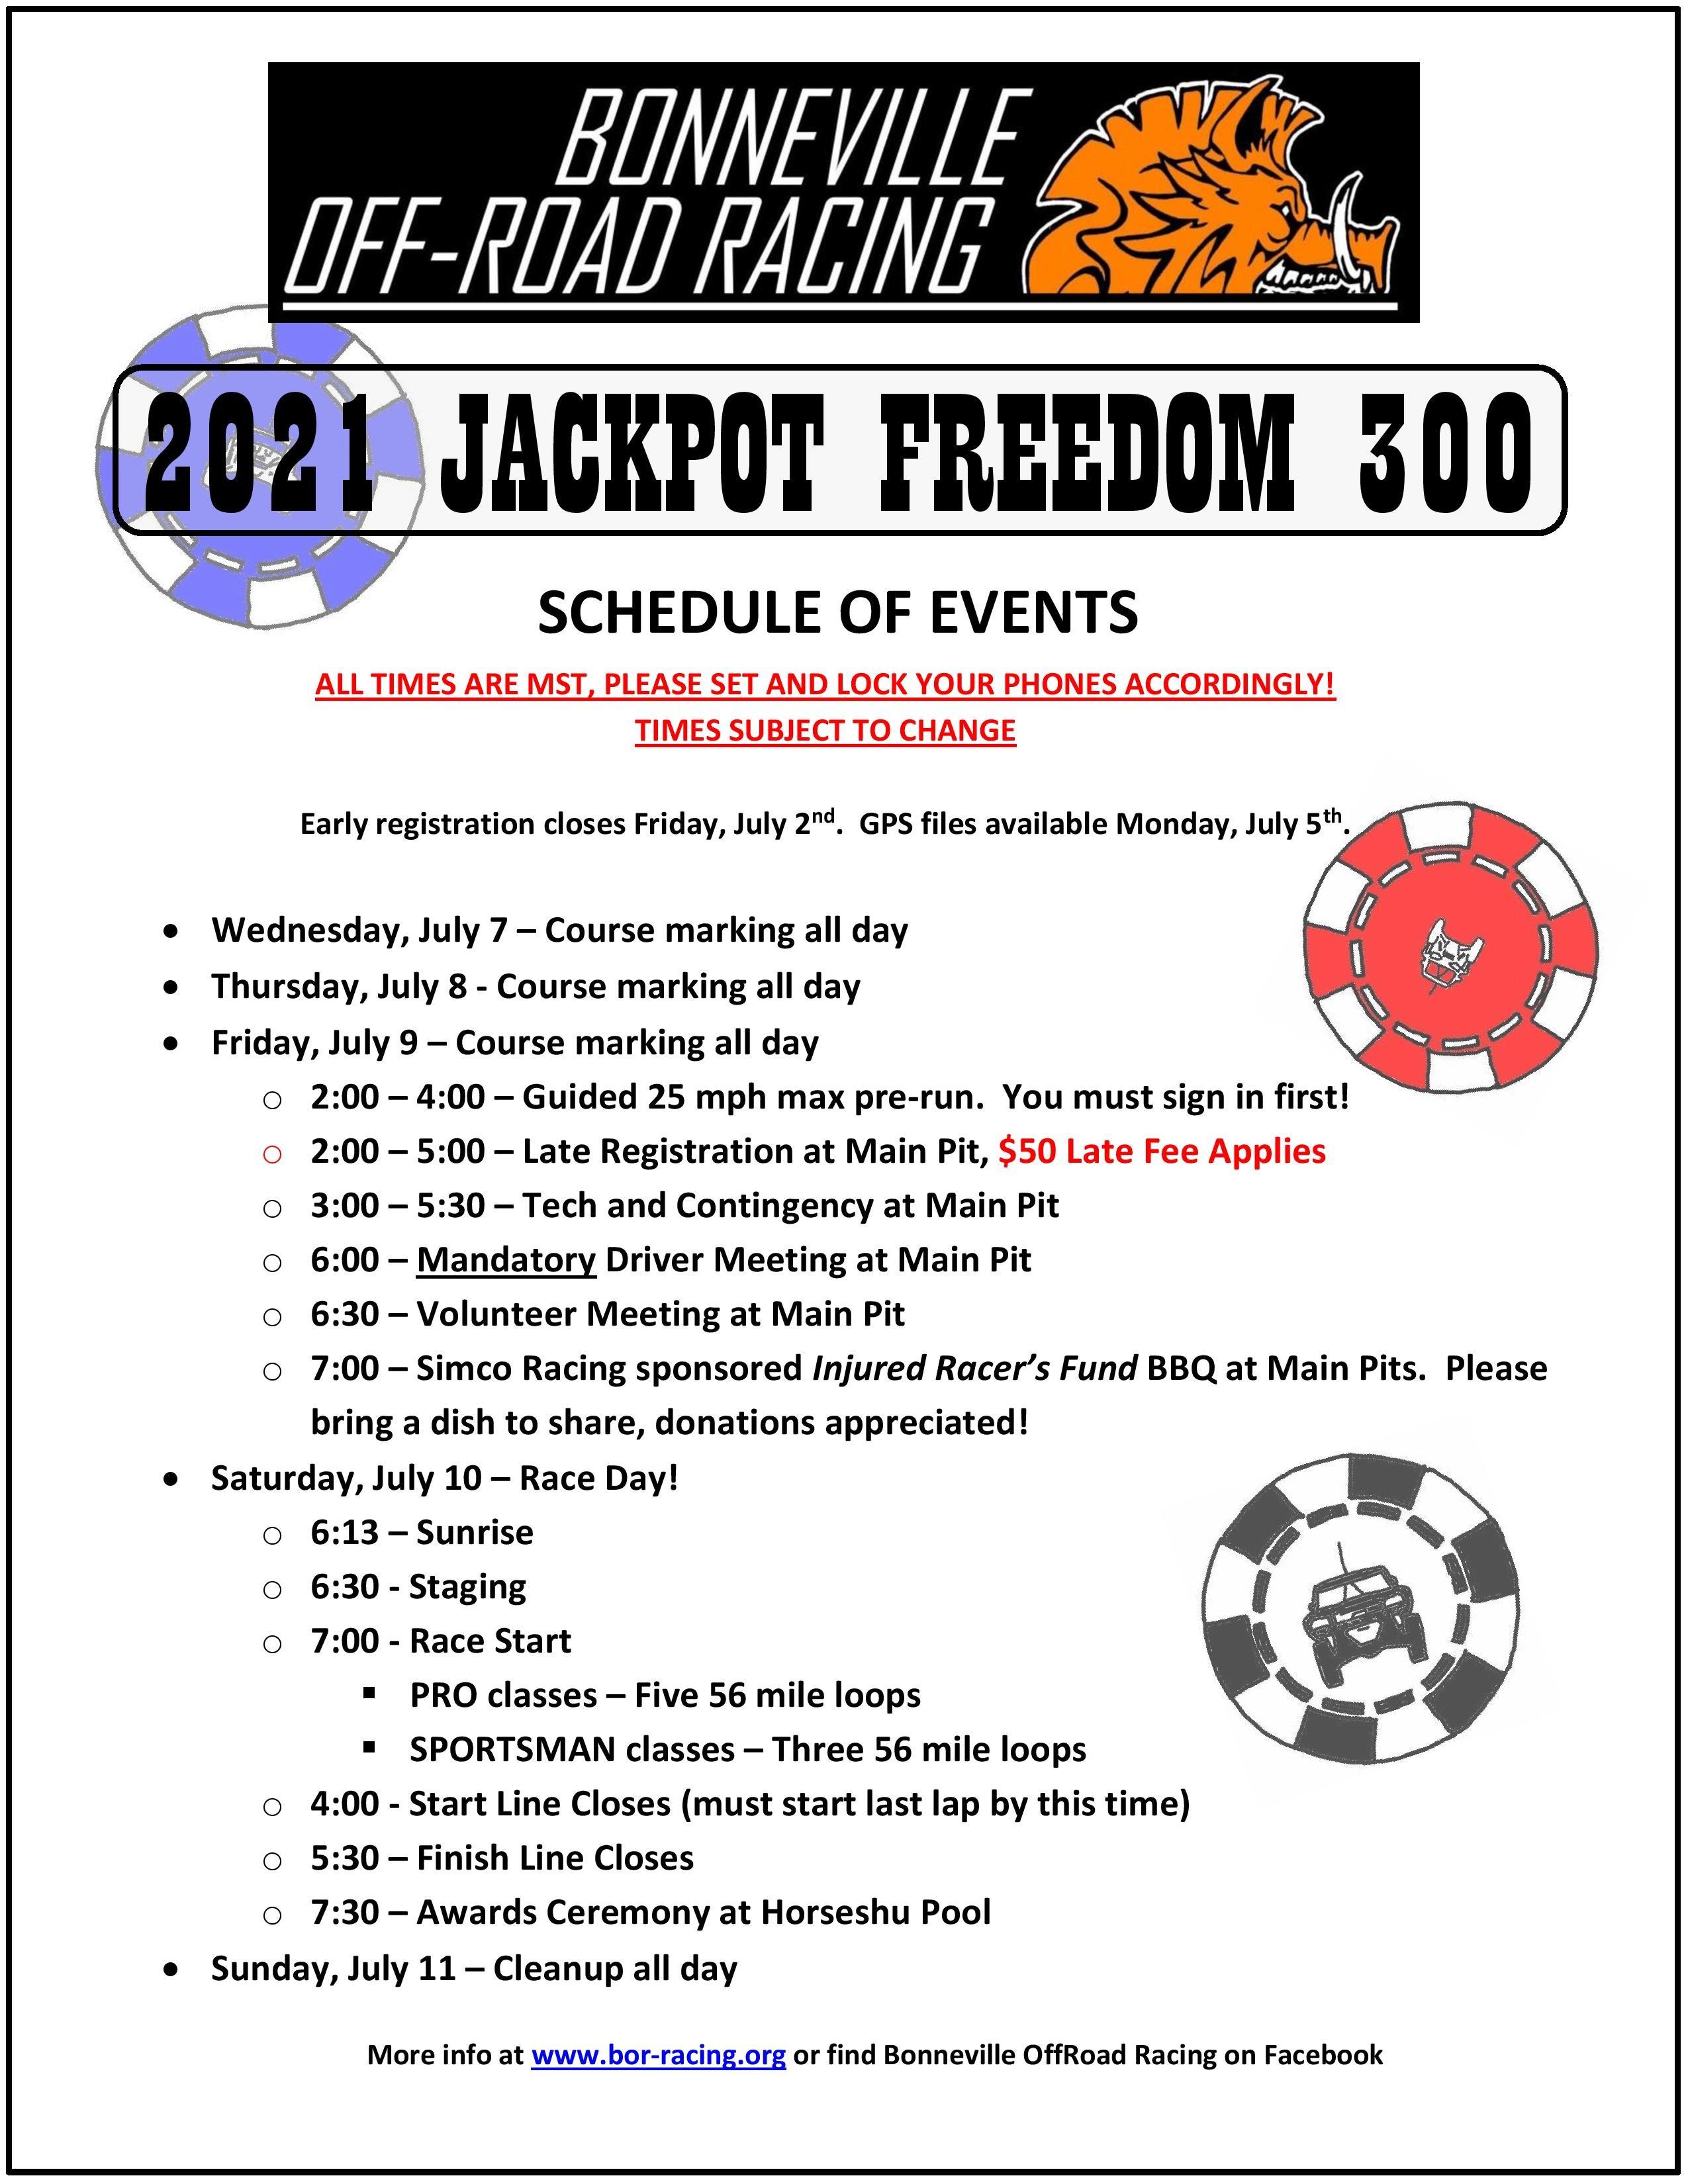 2021 Jackpot Freedom 300 Schedule of Events.jpg